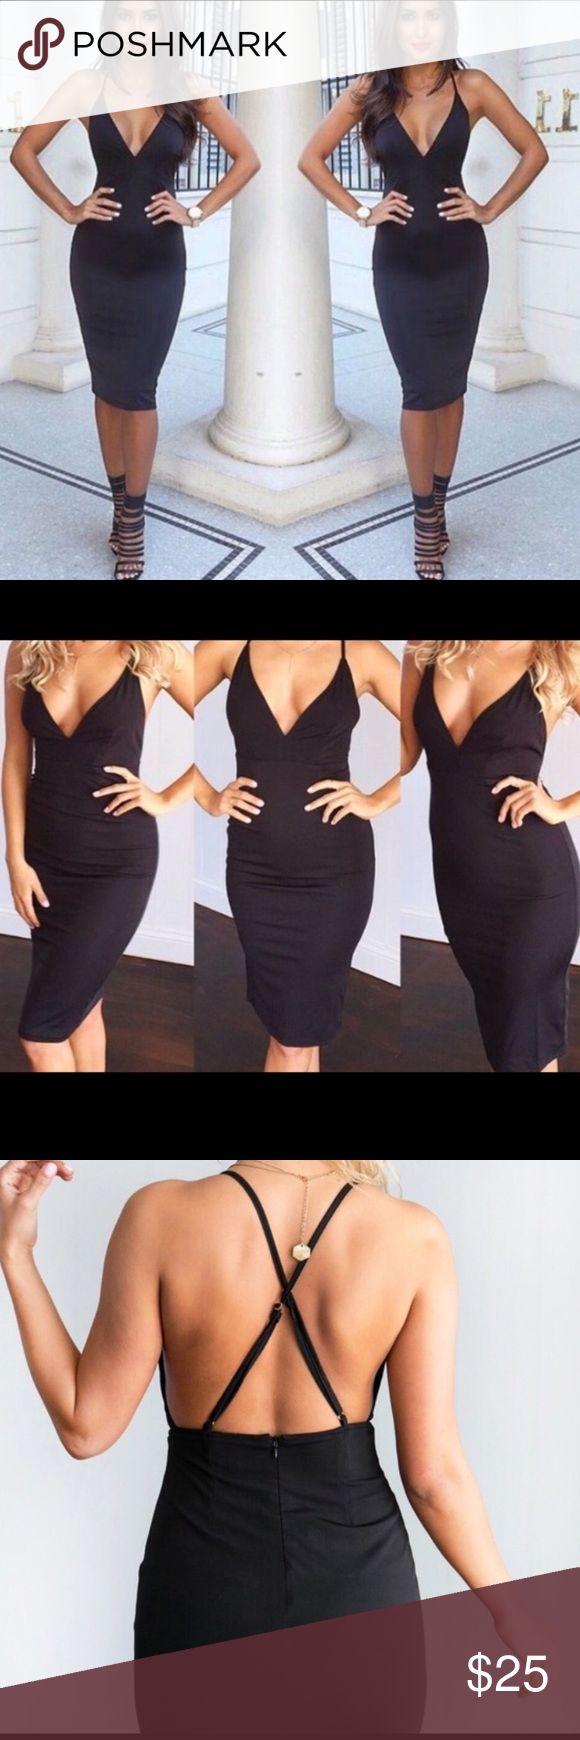 Little black dress NWT Little black bodycon dress from Mura Boutique. Size small. Adjustable straps. Mura Boutique Dresses Midi